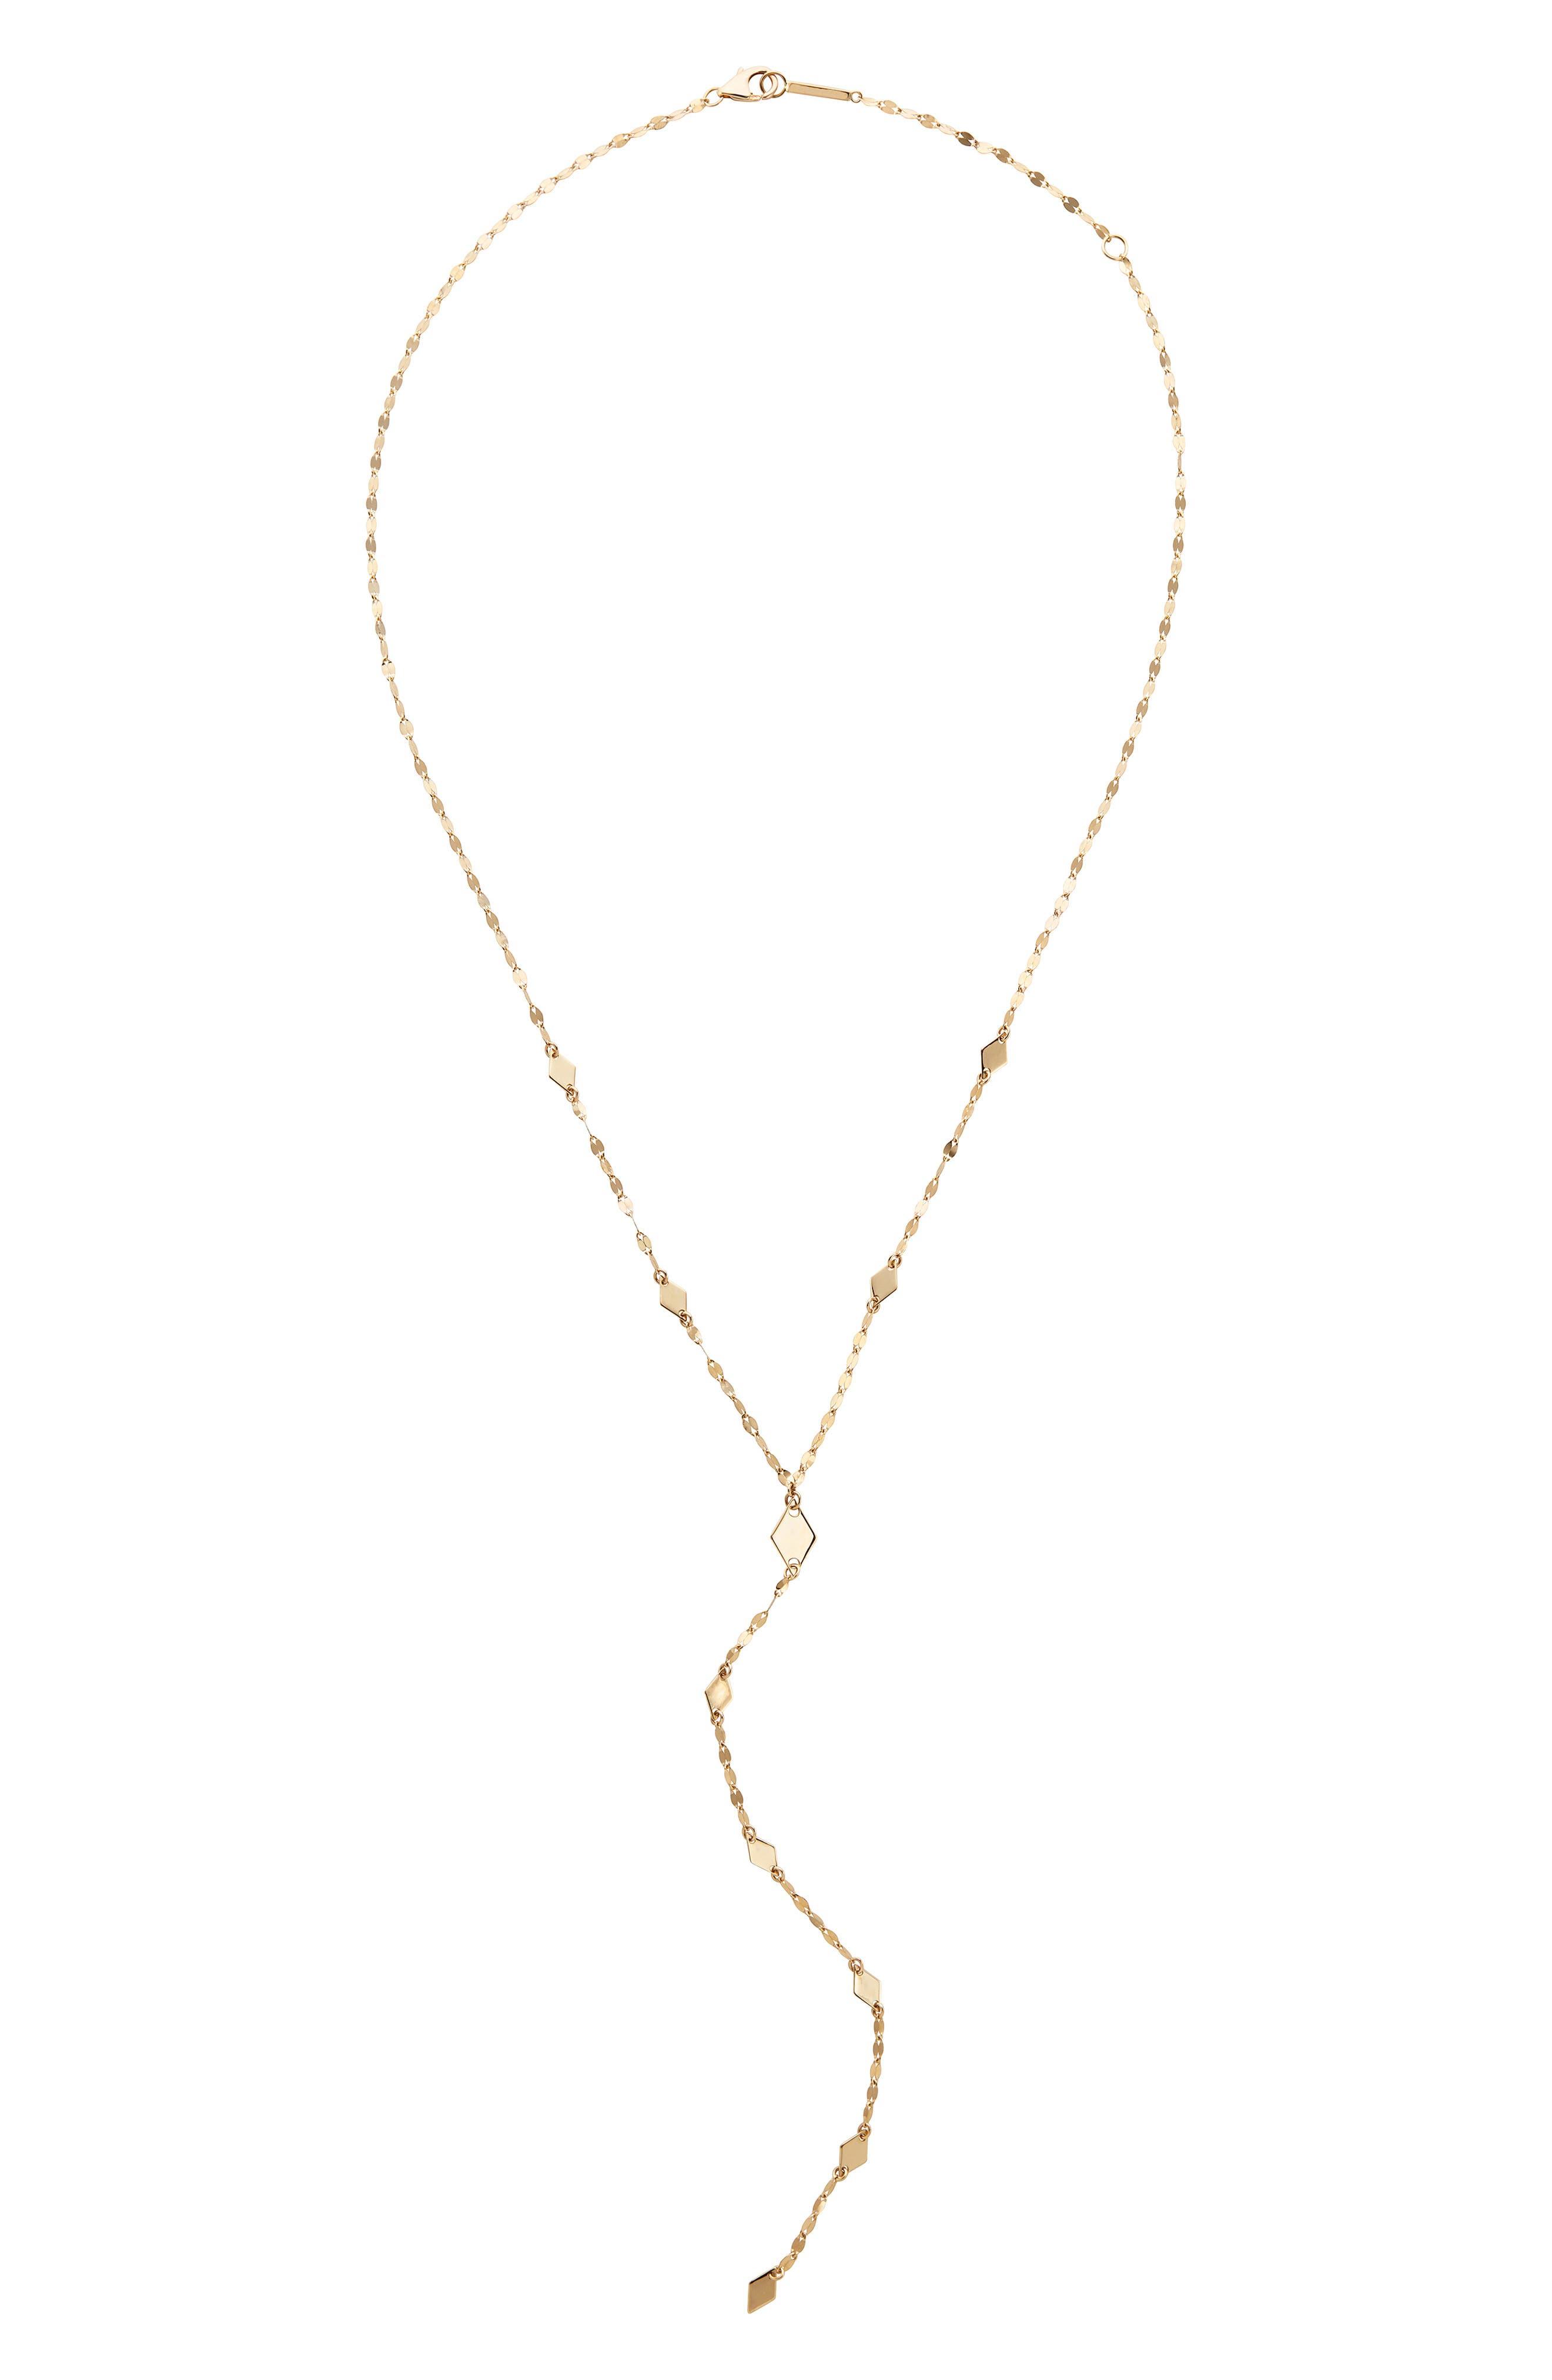 LANA JEWELRY,                             Mixed Mini Kite & Kite Y-Necklace,                             Main thumbnail 1, color,                             GOLD